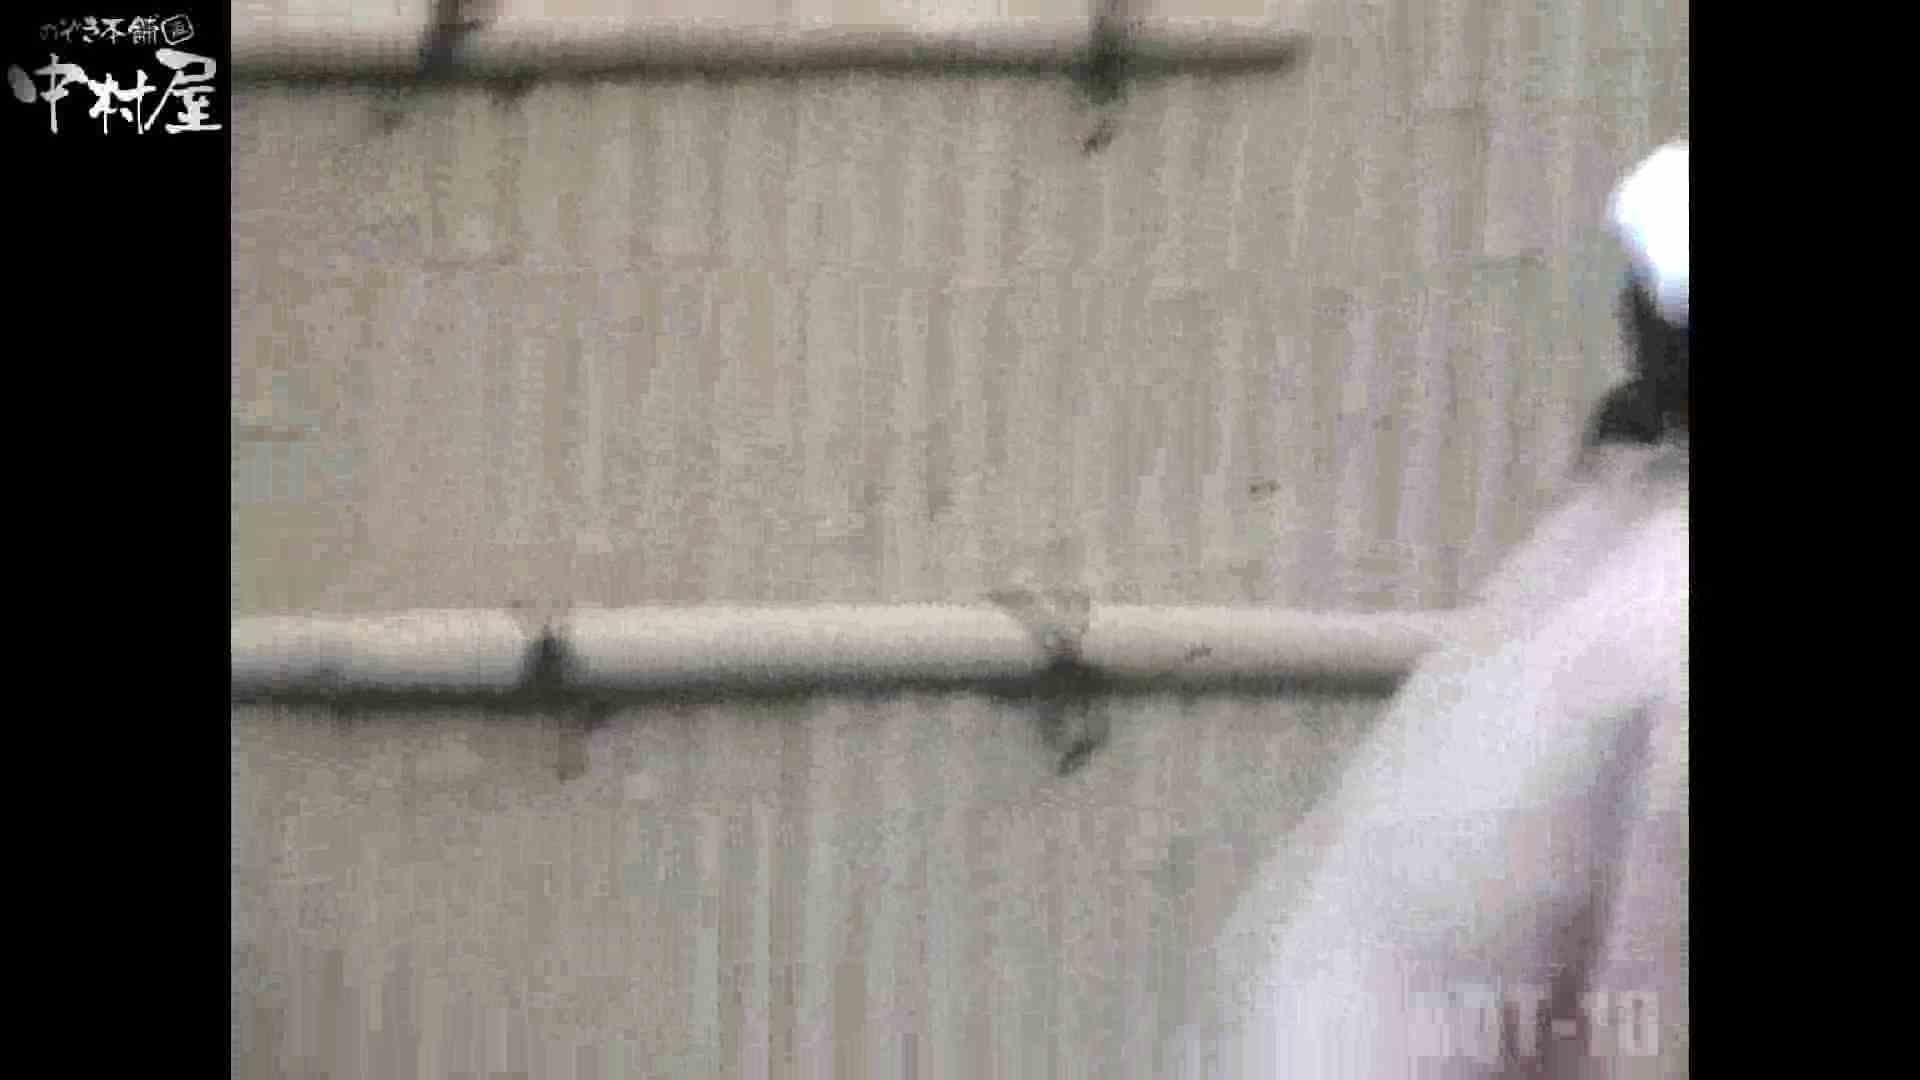 Aquaな露天風呂Vol.880潜入盗撮露天風呂十六判湯 其の六 盗撮シリーズ | 潜入  91PIX 88